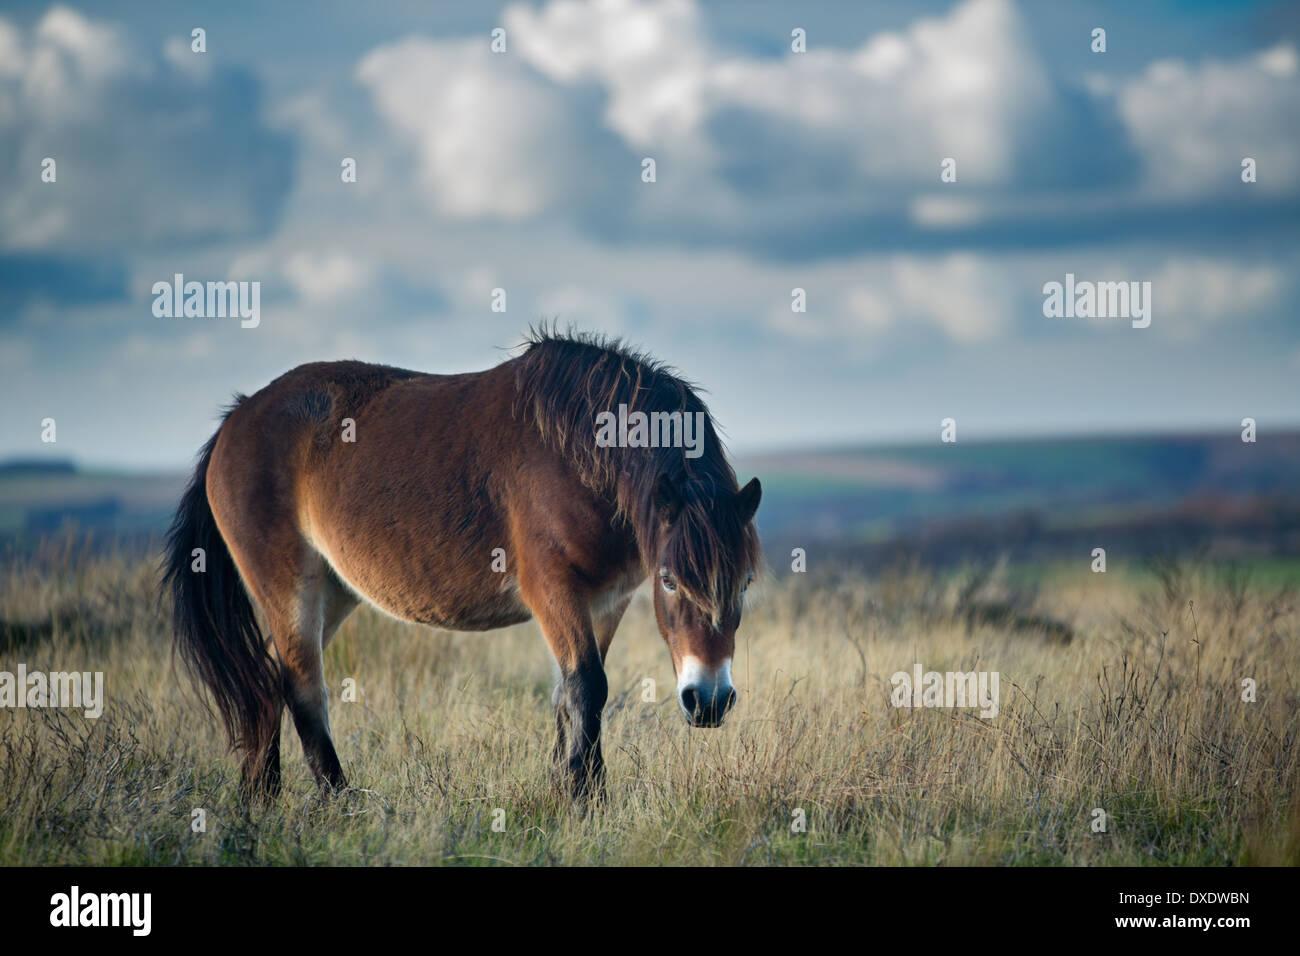 Wildpferde auf Winsford Hill, Exmoor National Park, Somerset, England, UK Stockbild